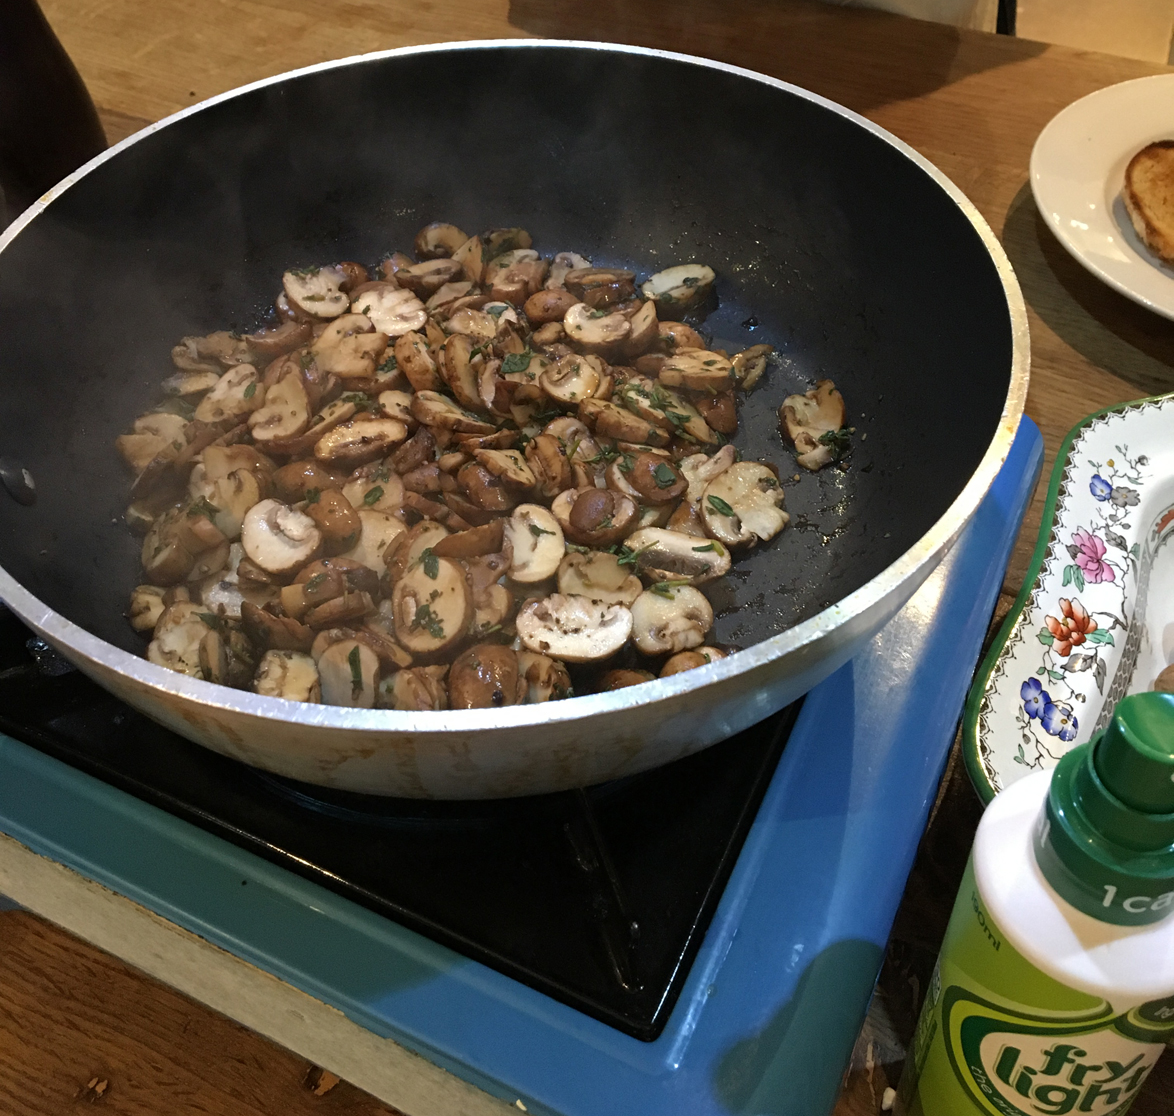 Mushrooms cooking in a pan